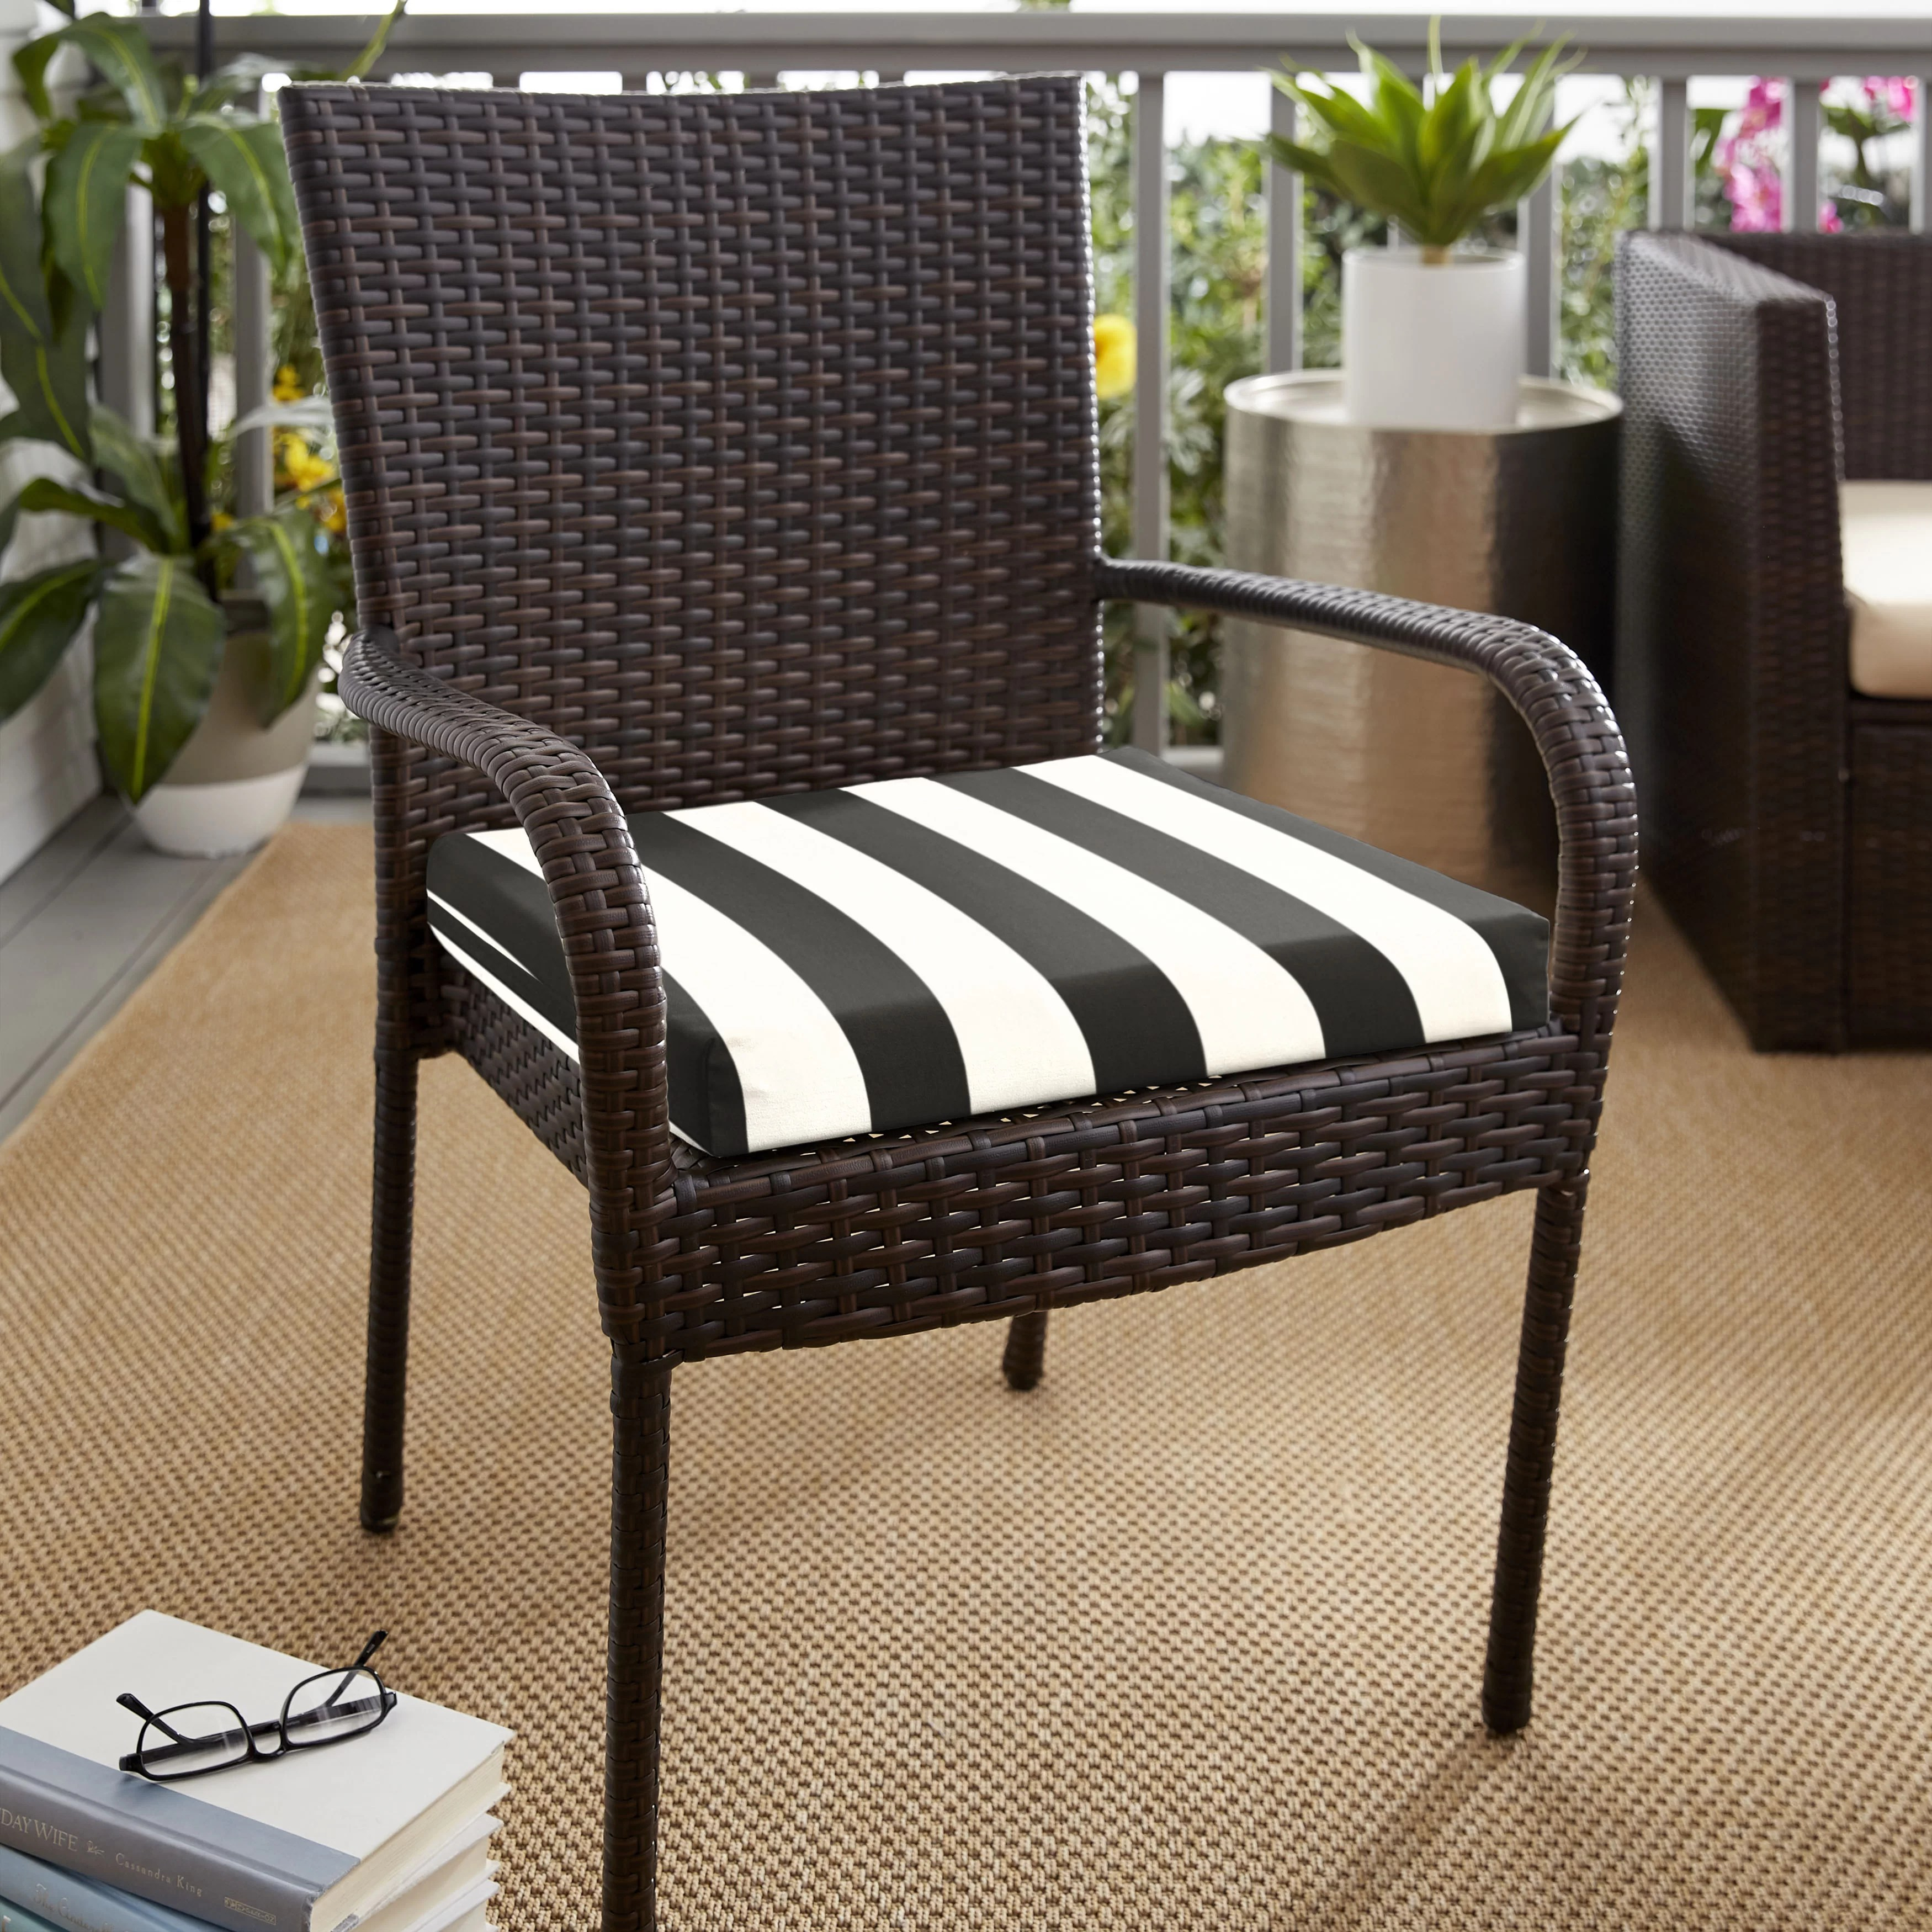 cabana classic indoor outdoor sunbrella dining chair cushion